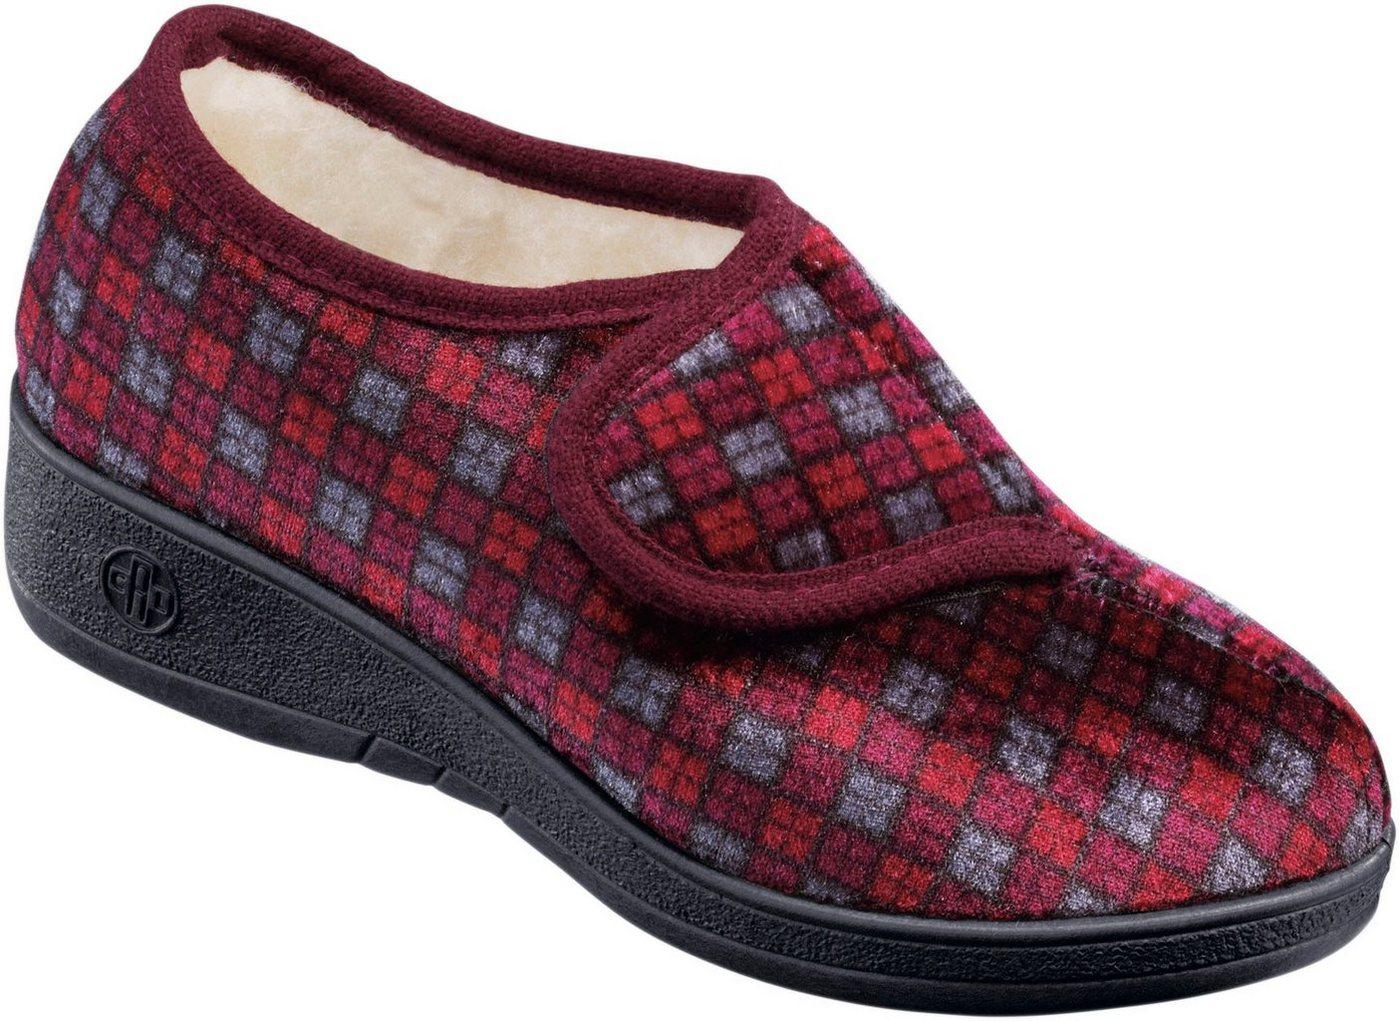 Landgraf Hausschuh mit Synthetik-Laufsohle   Schuhe > Hausschuhe   Rot   Samt   Landgraf